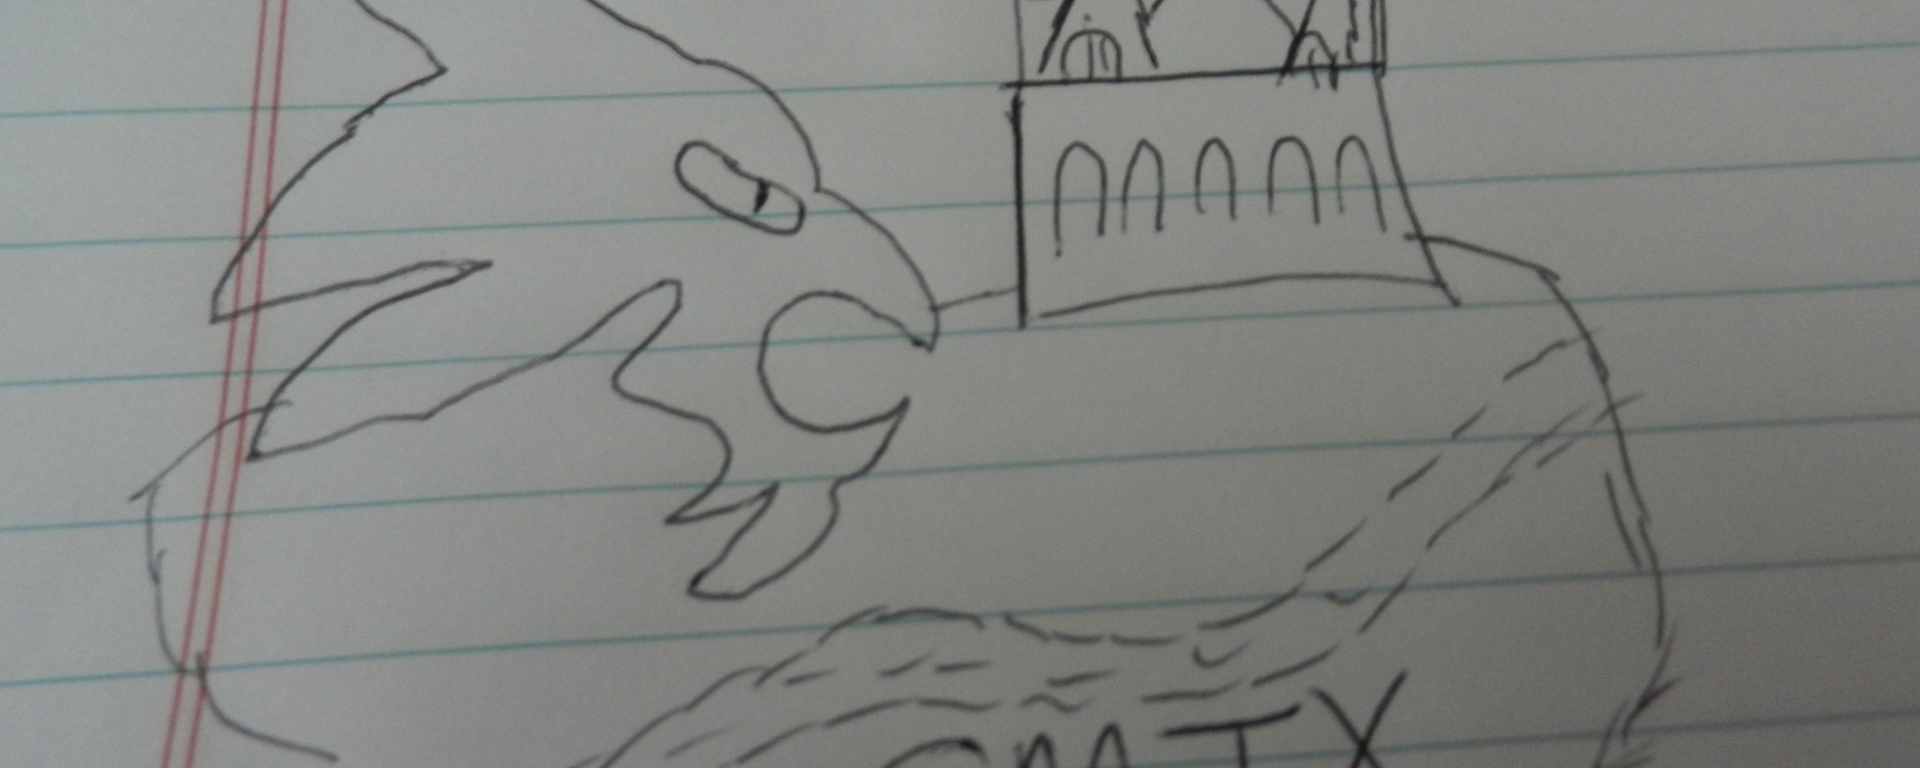 A drawing of Old Main and TXST Bobcats making up San Marcos.